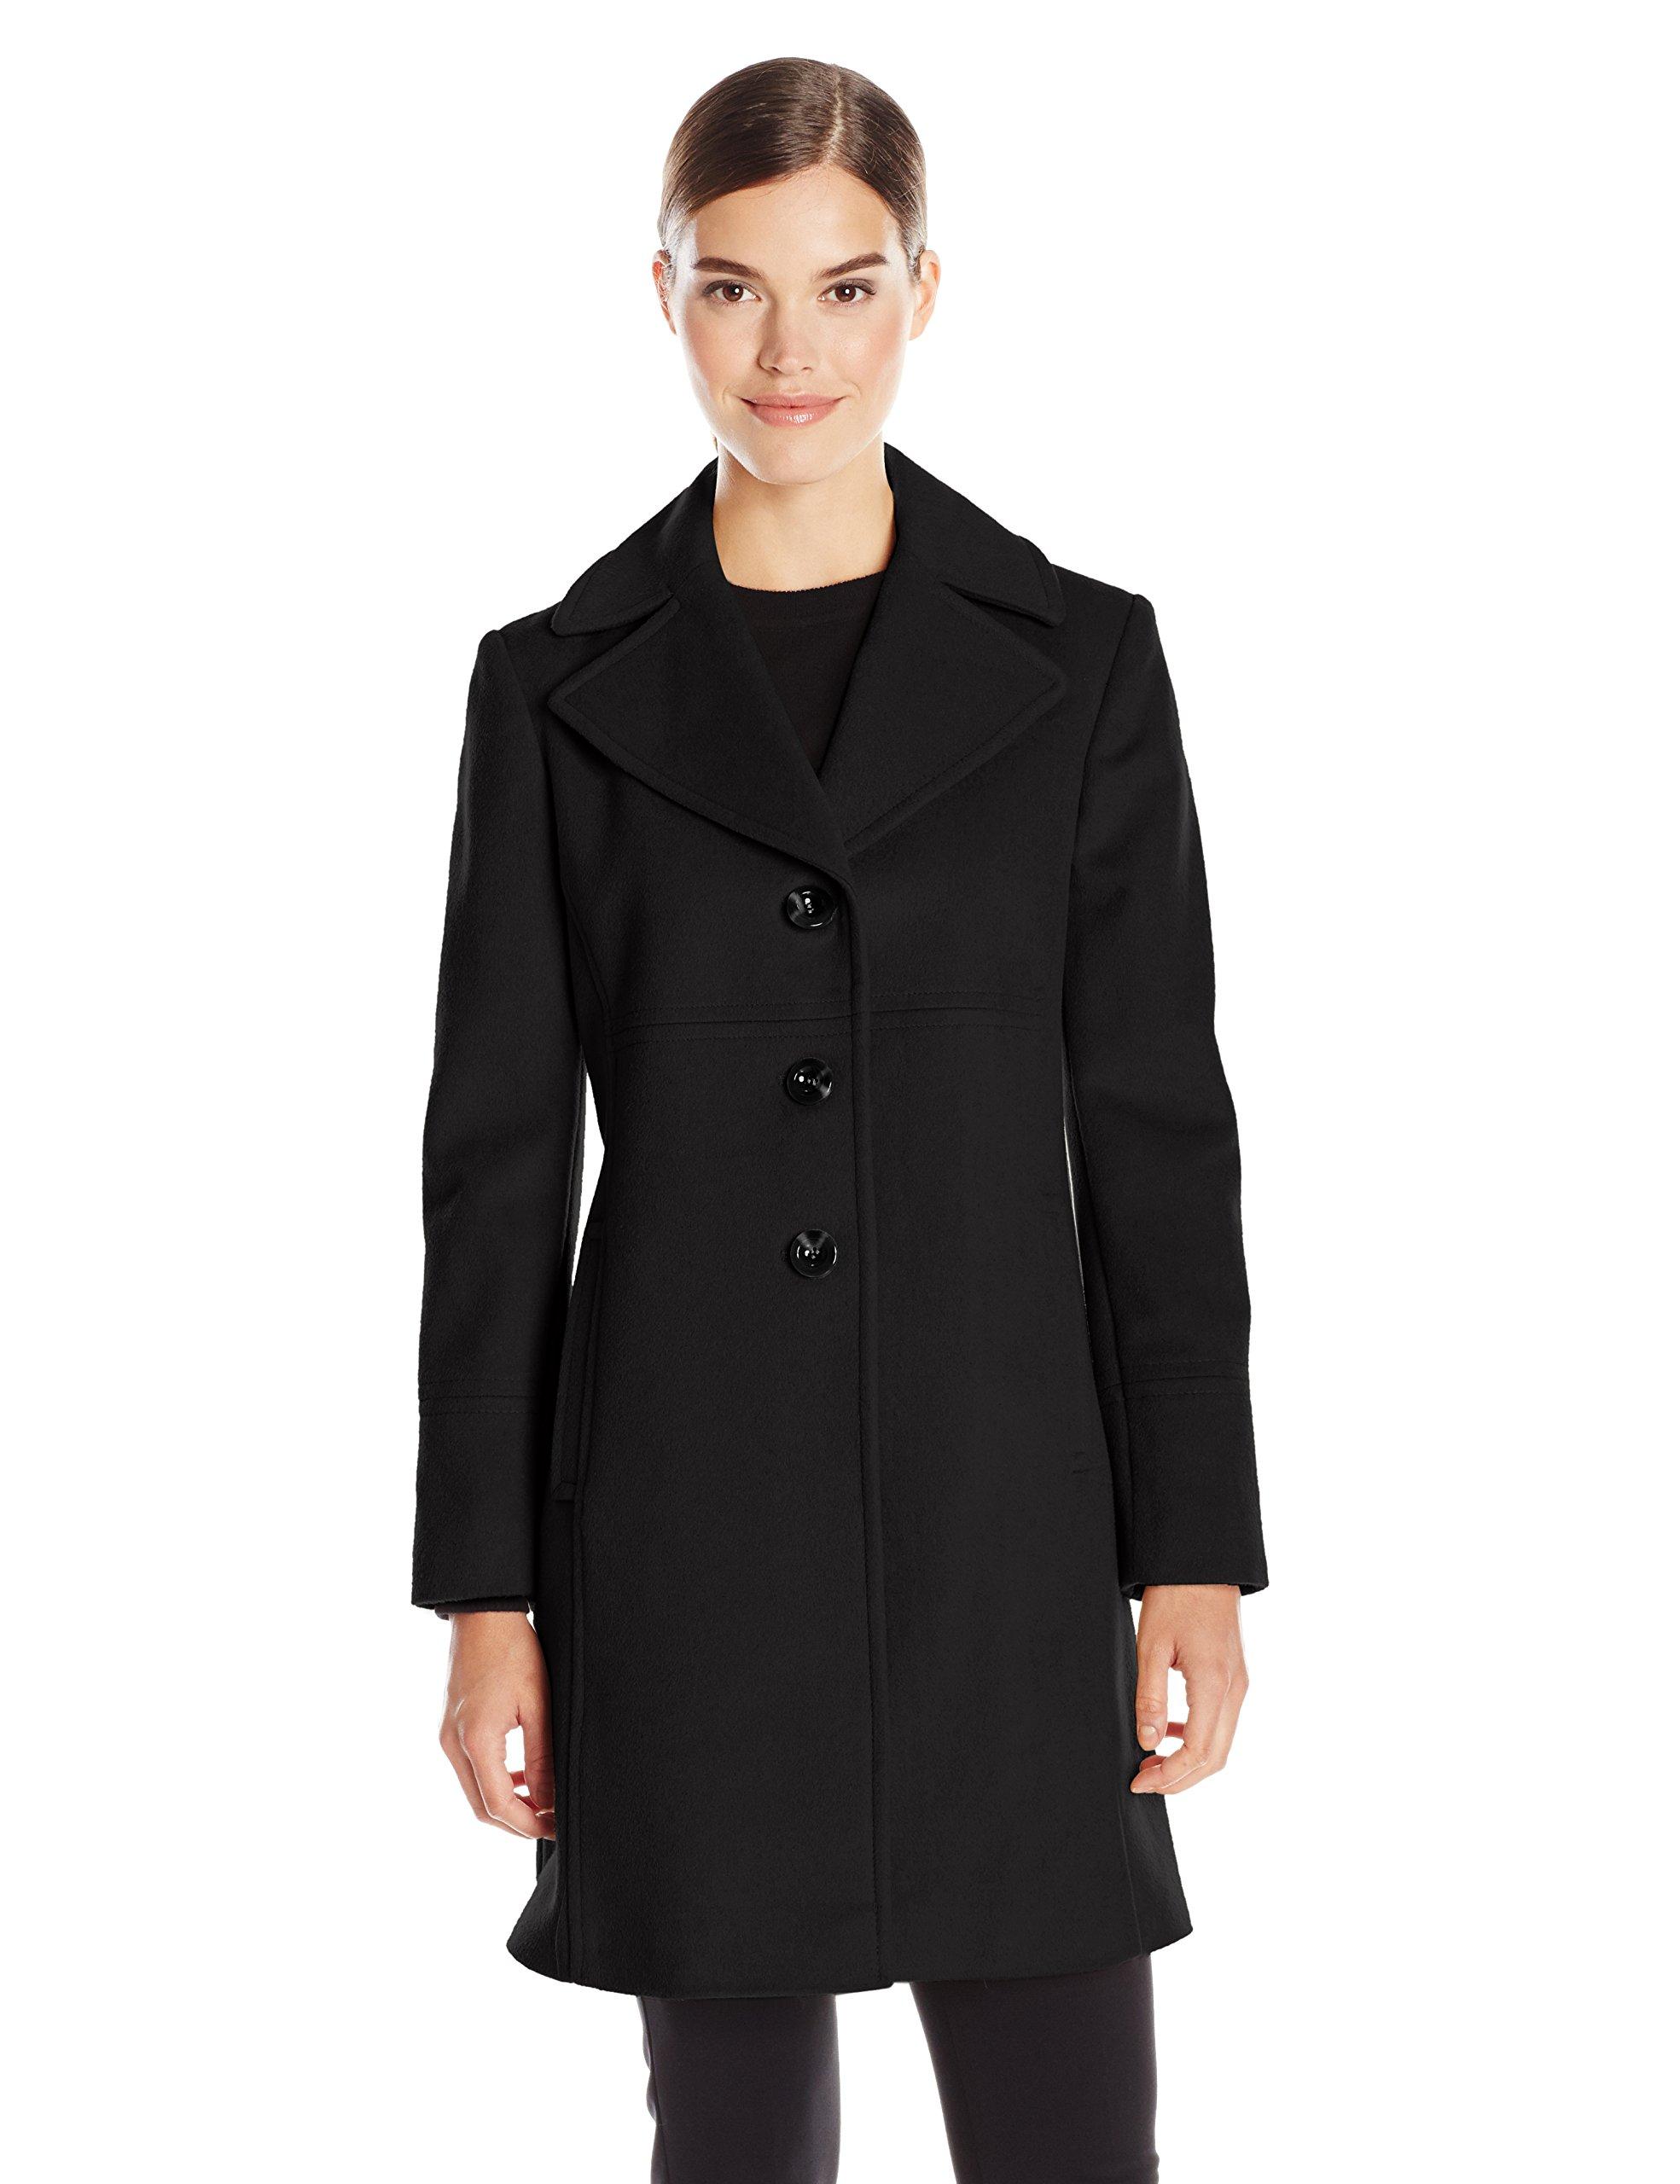 Larry Levine Women's Single Breasted Notch Collar Wool Coat, Black, 10